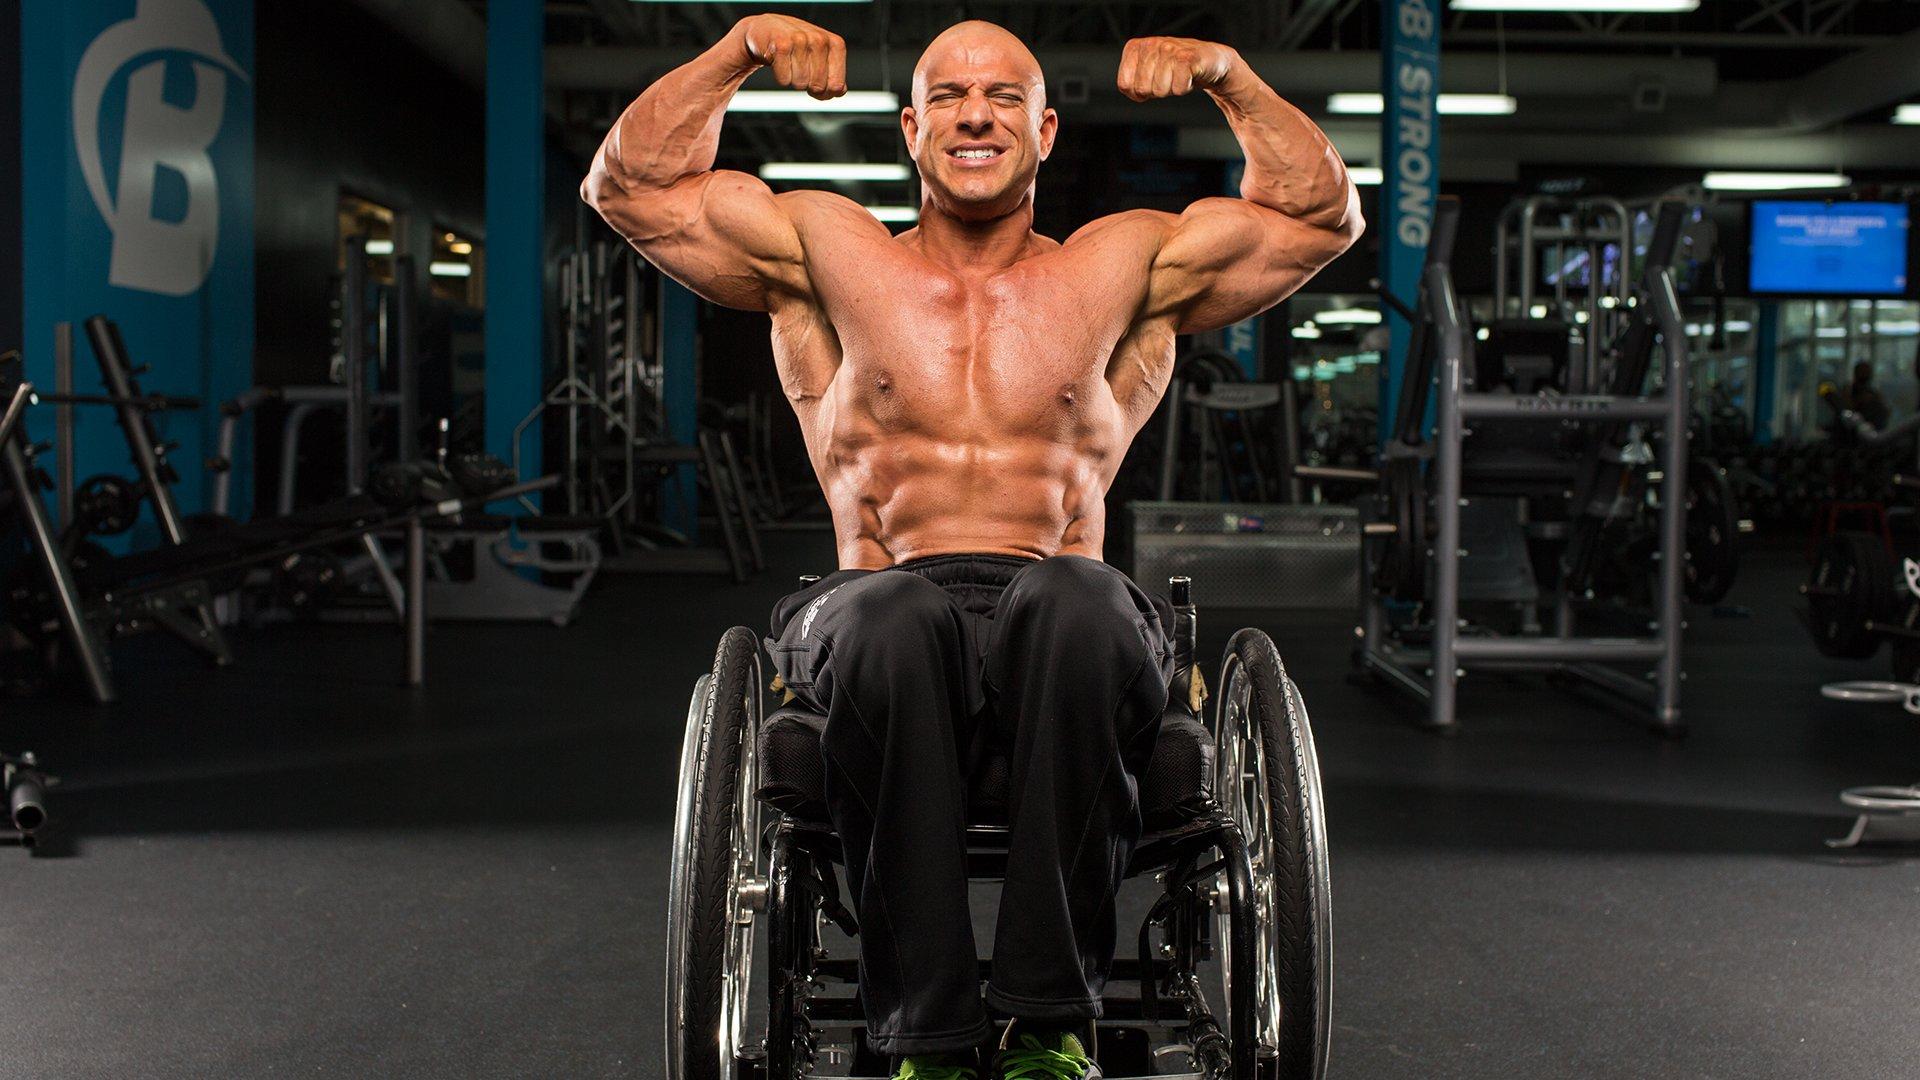 Rising up the story of wheelchair bodybuilder nick scott